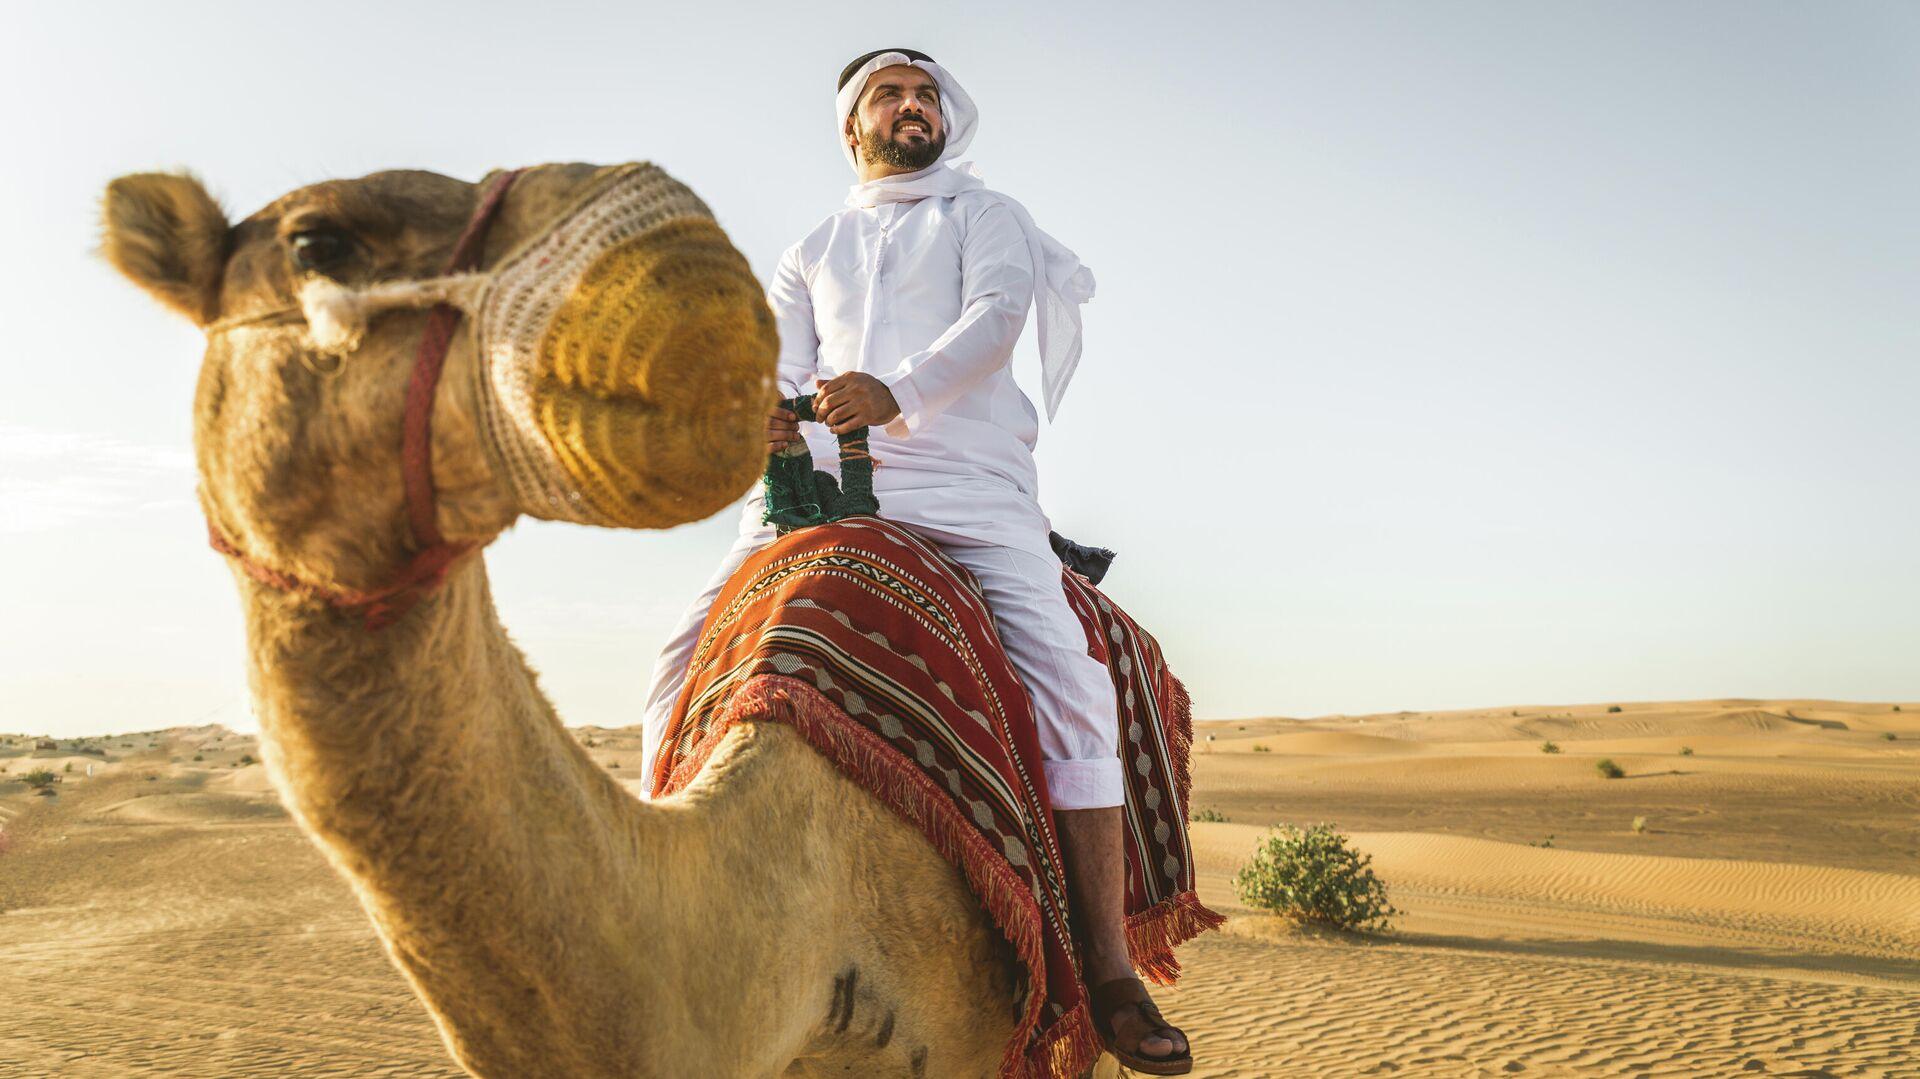 Мужчина в пустыне на верблюде - РИА Новости, 1920, 09.12.2020